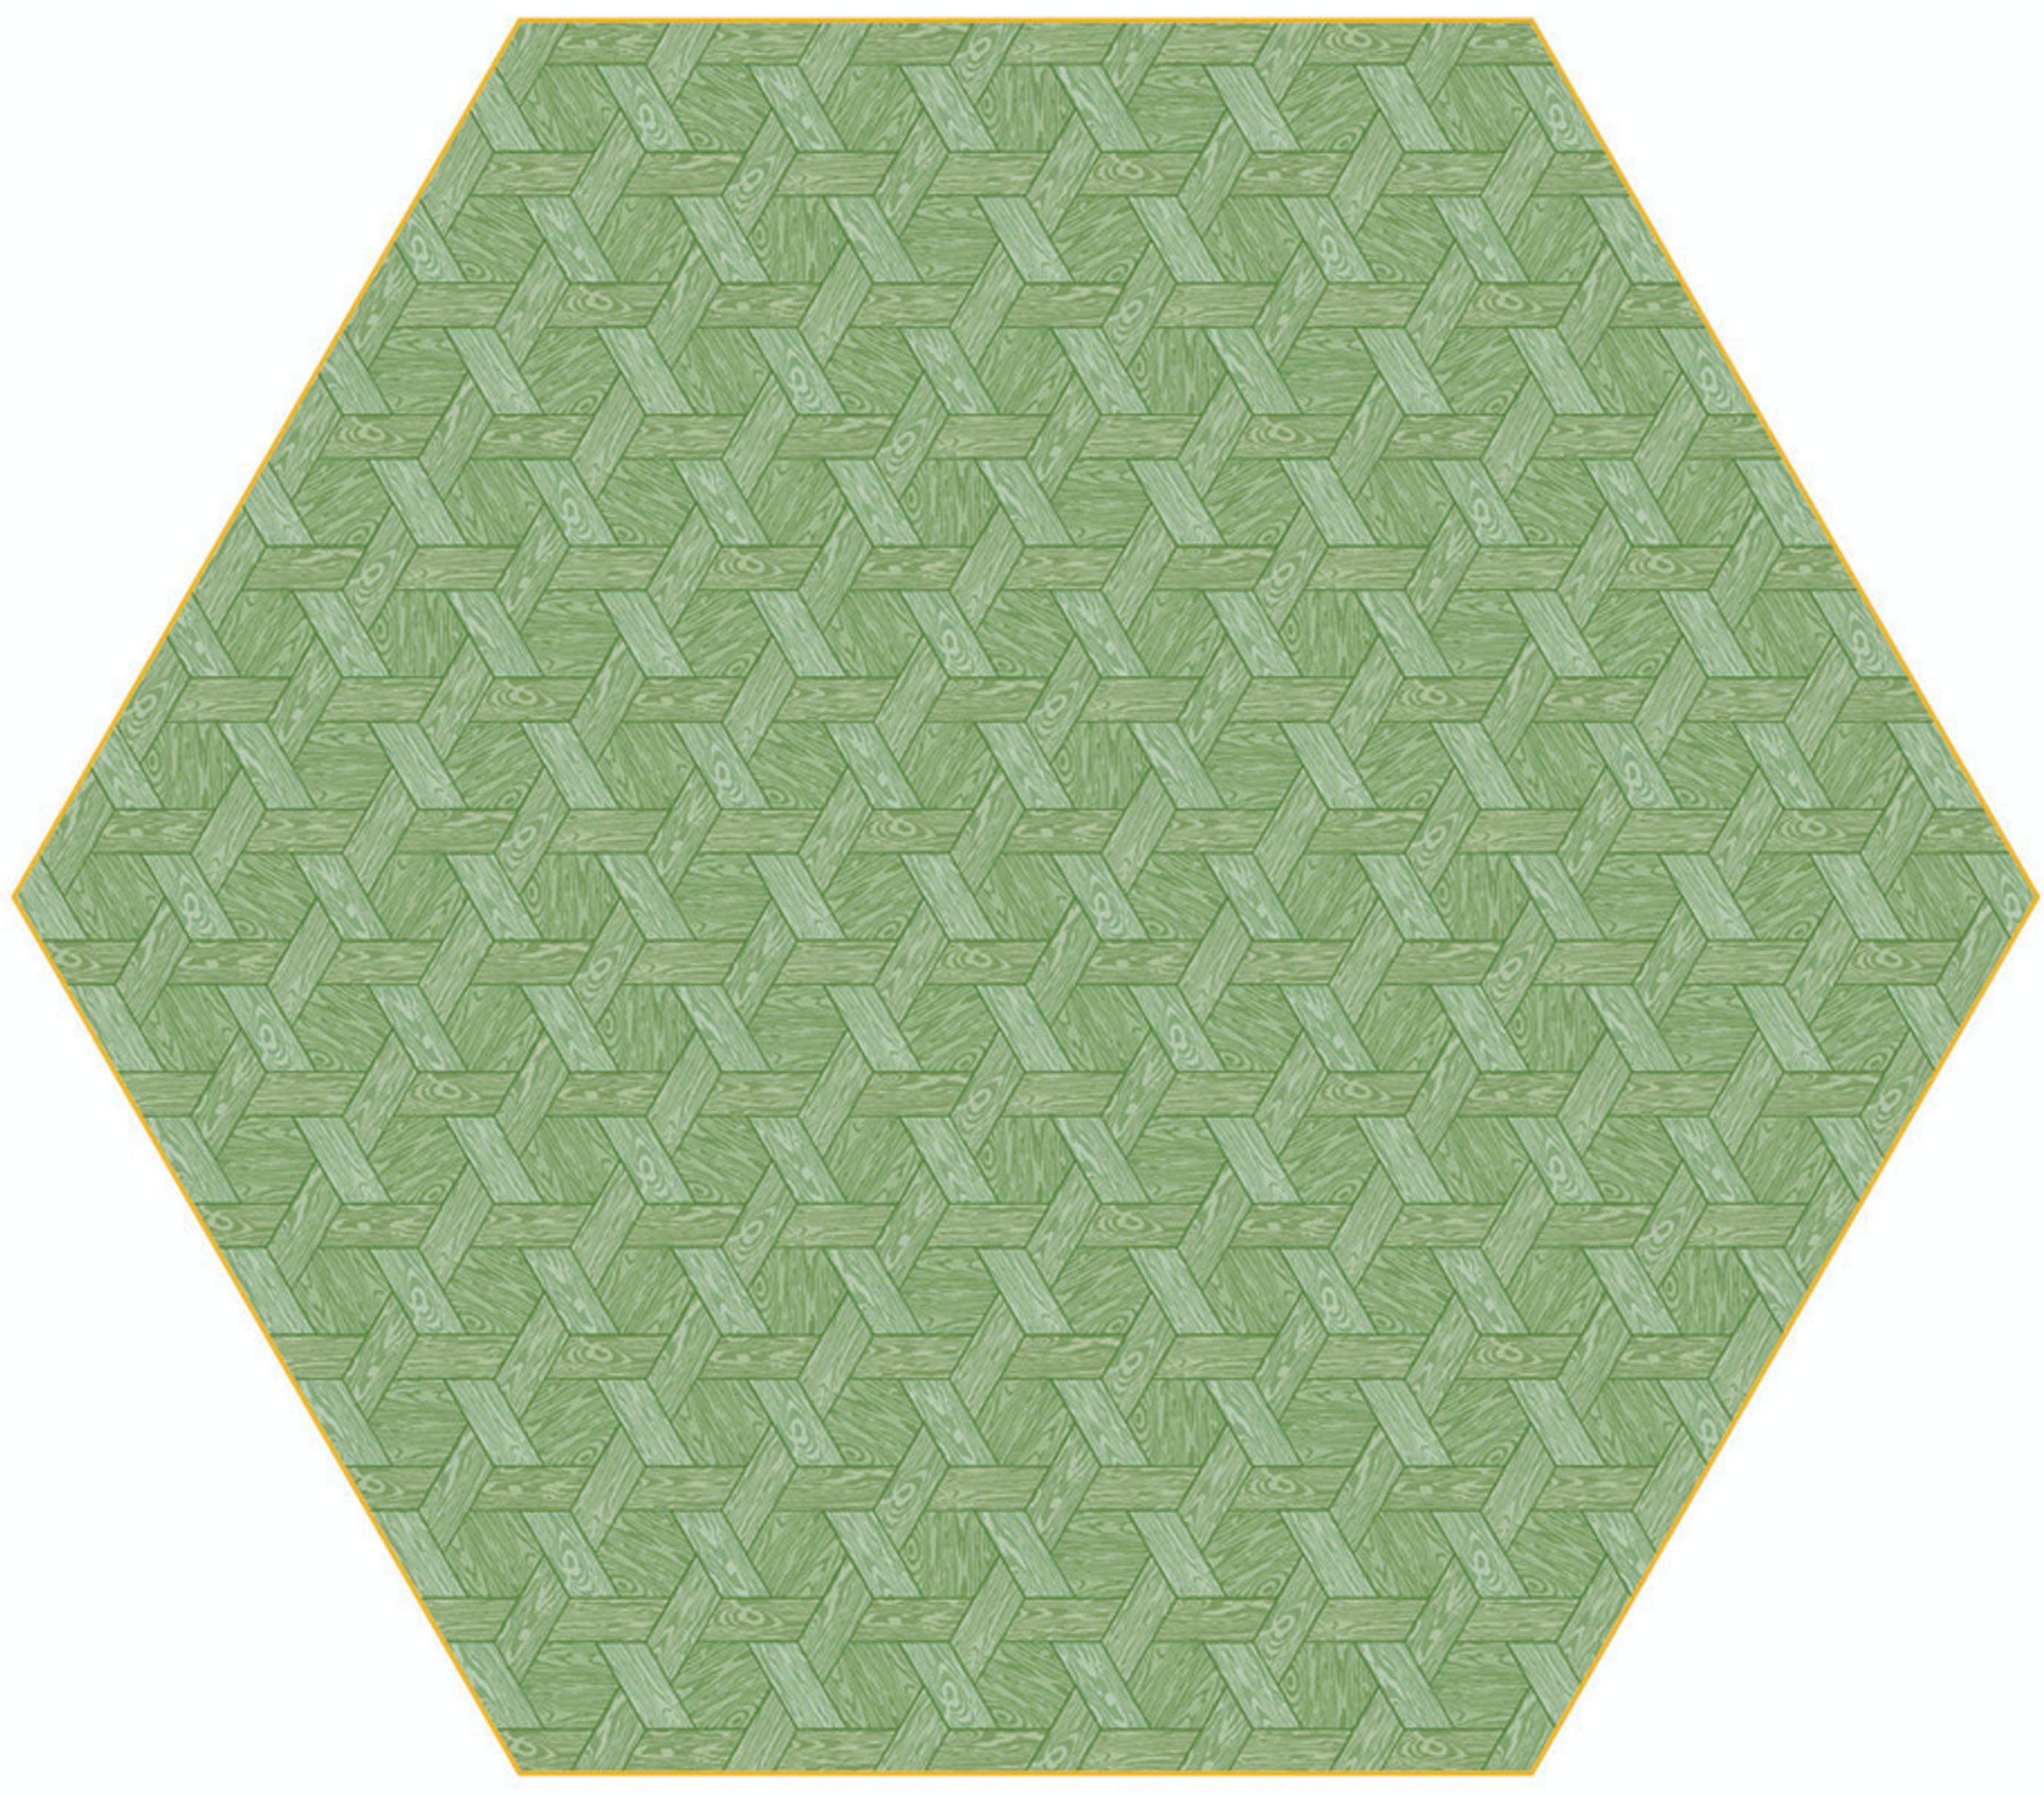 Hexagon Carpet Green By Studio Job For Moooi Carpets 300Dpi Moooi 1